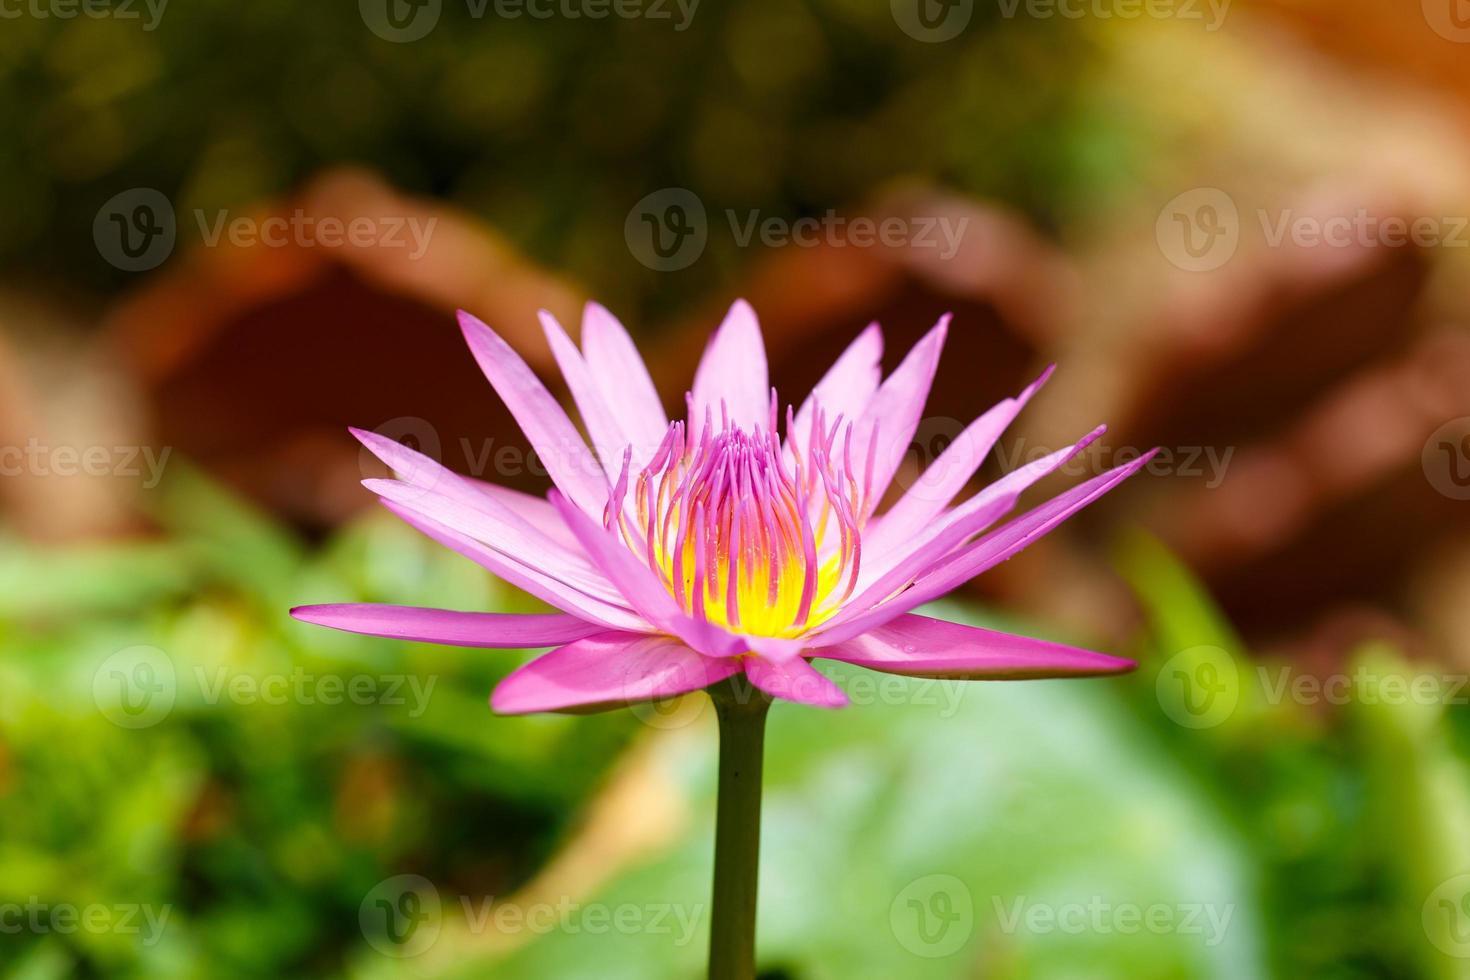 fiore di loto viola in fiore foto